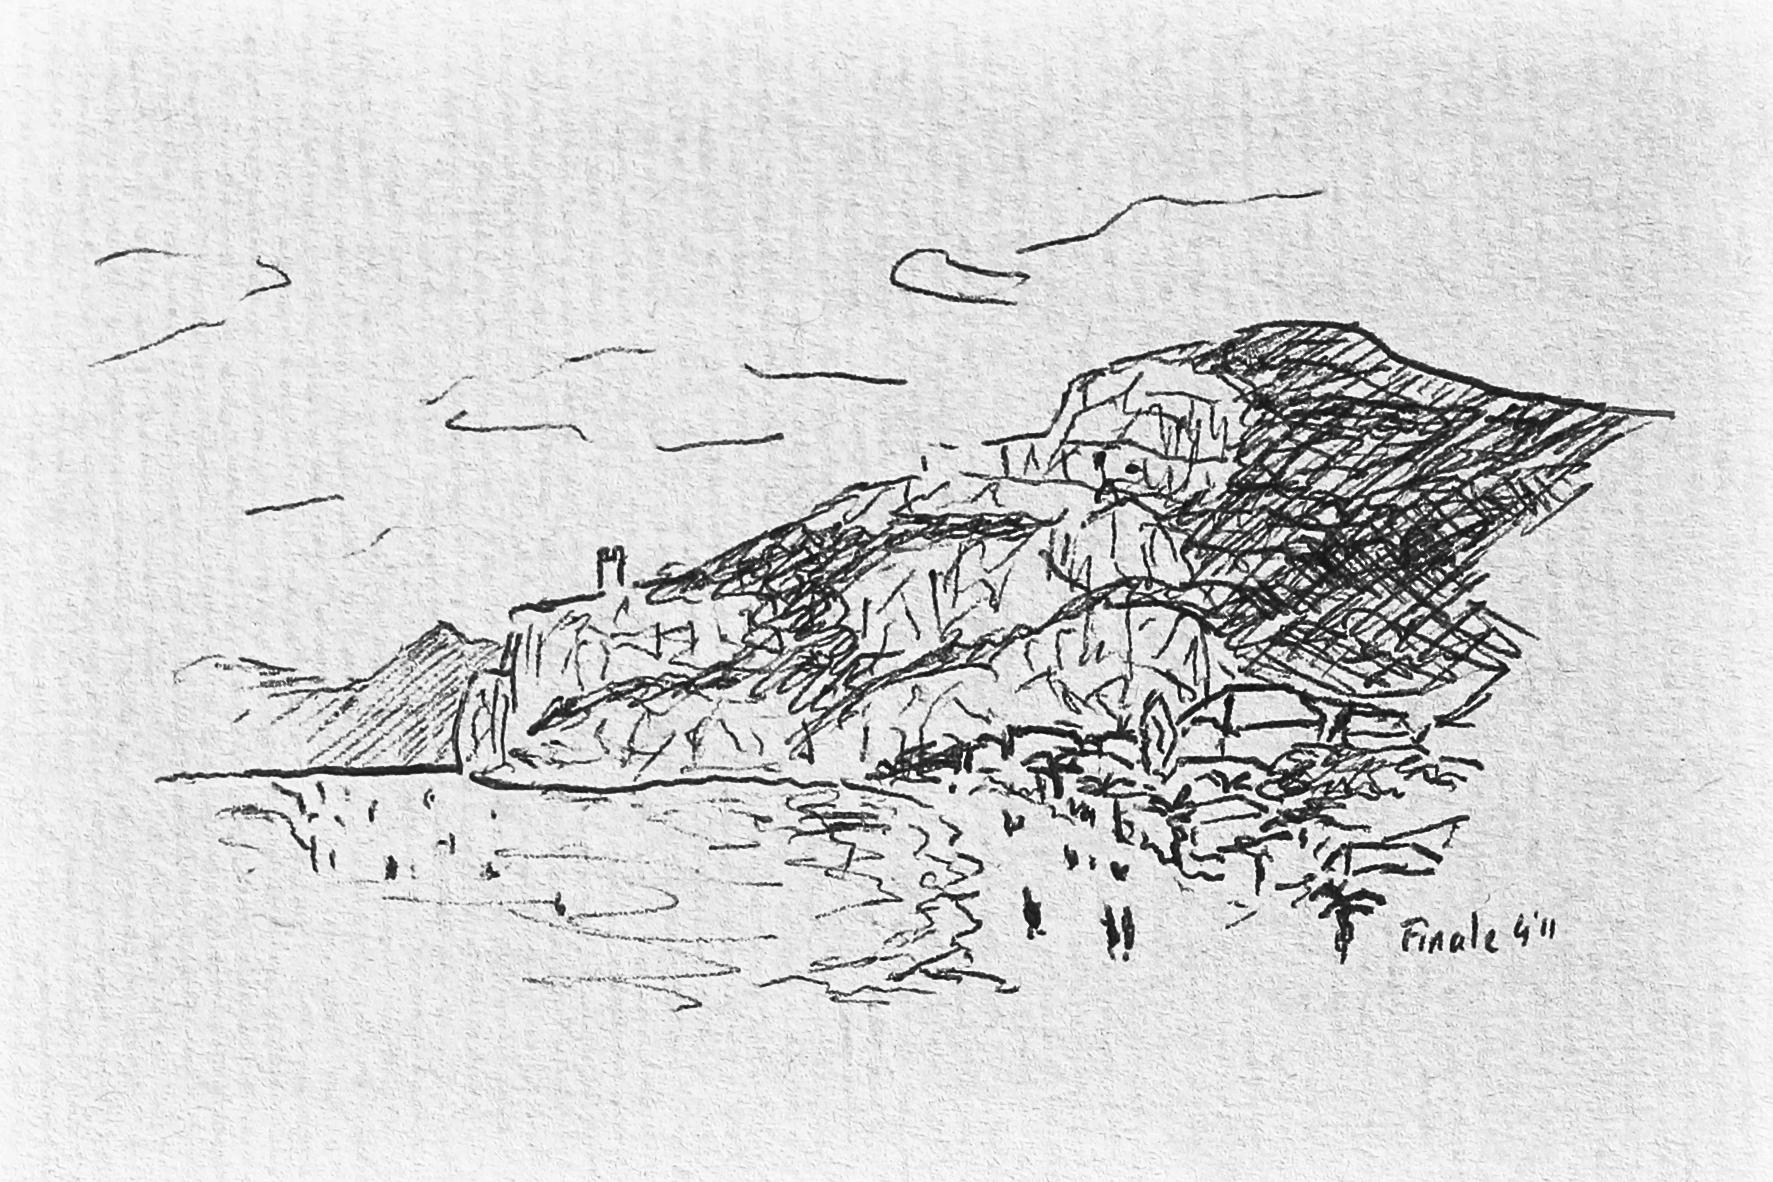 Strand bei Finale